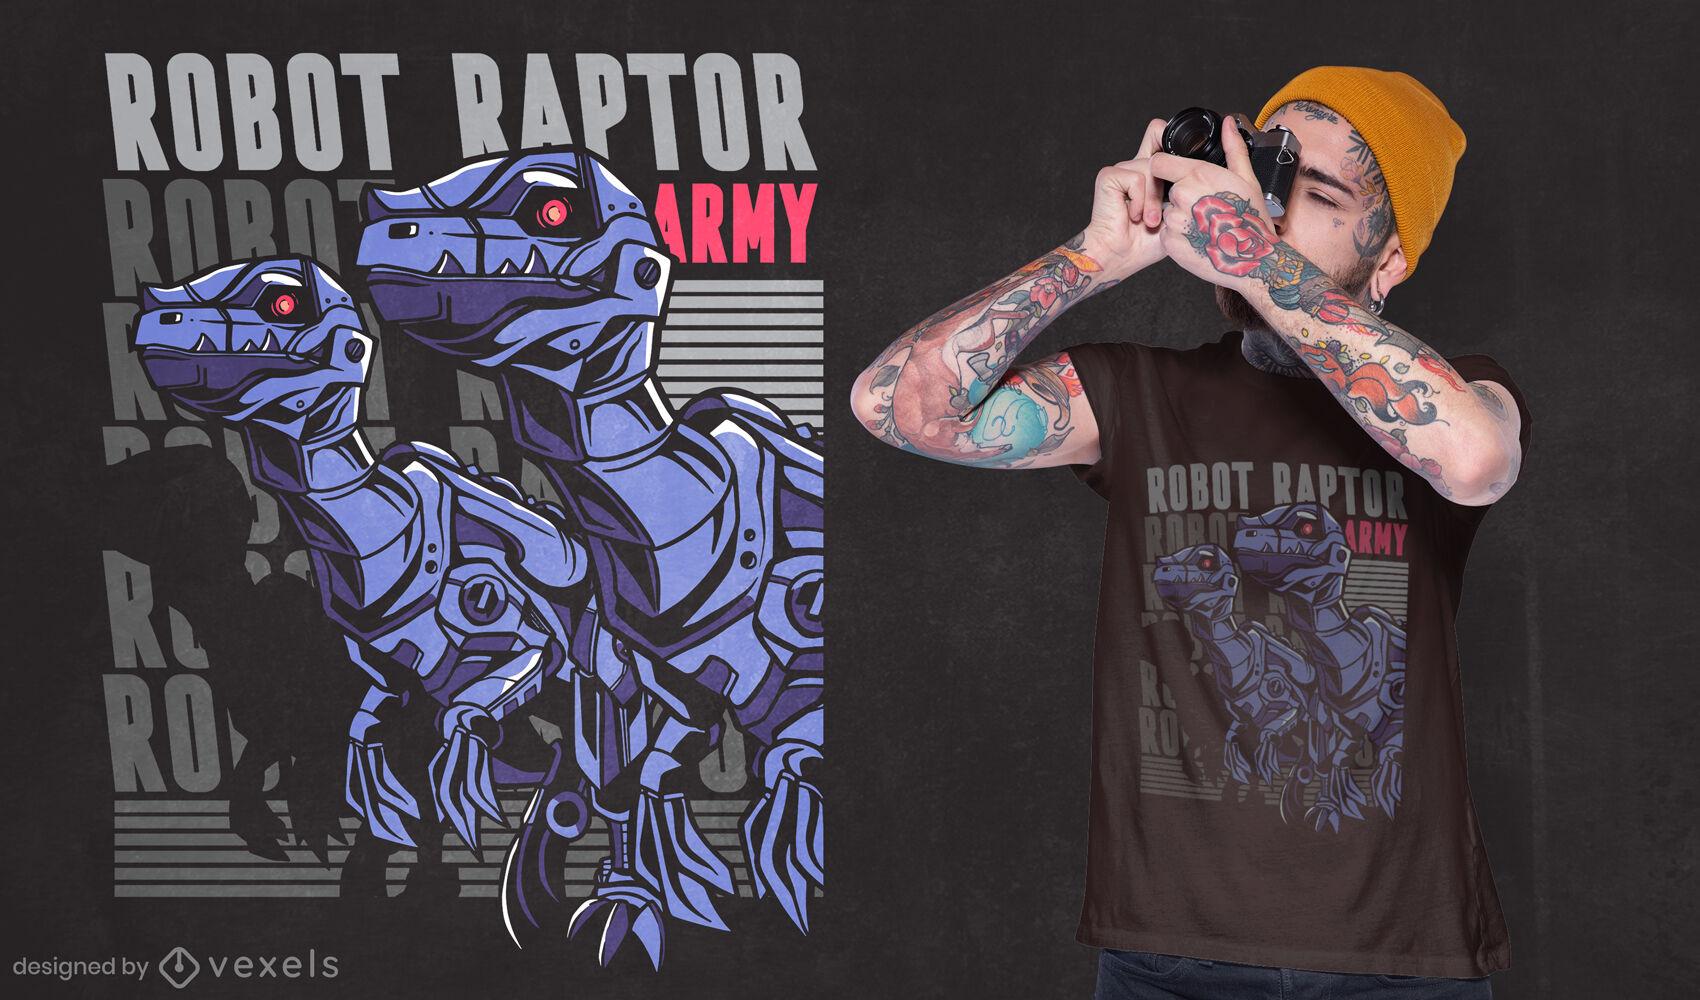 Cool robot raptor t-shirt design